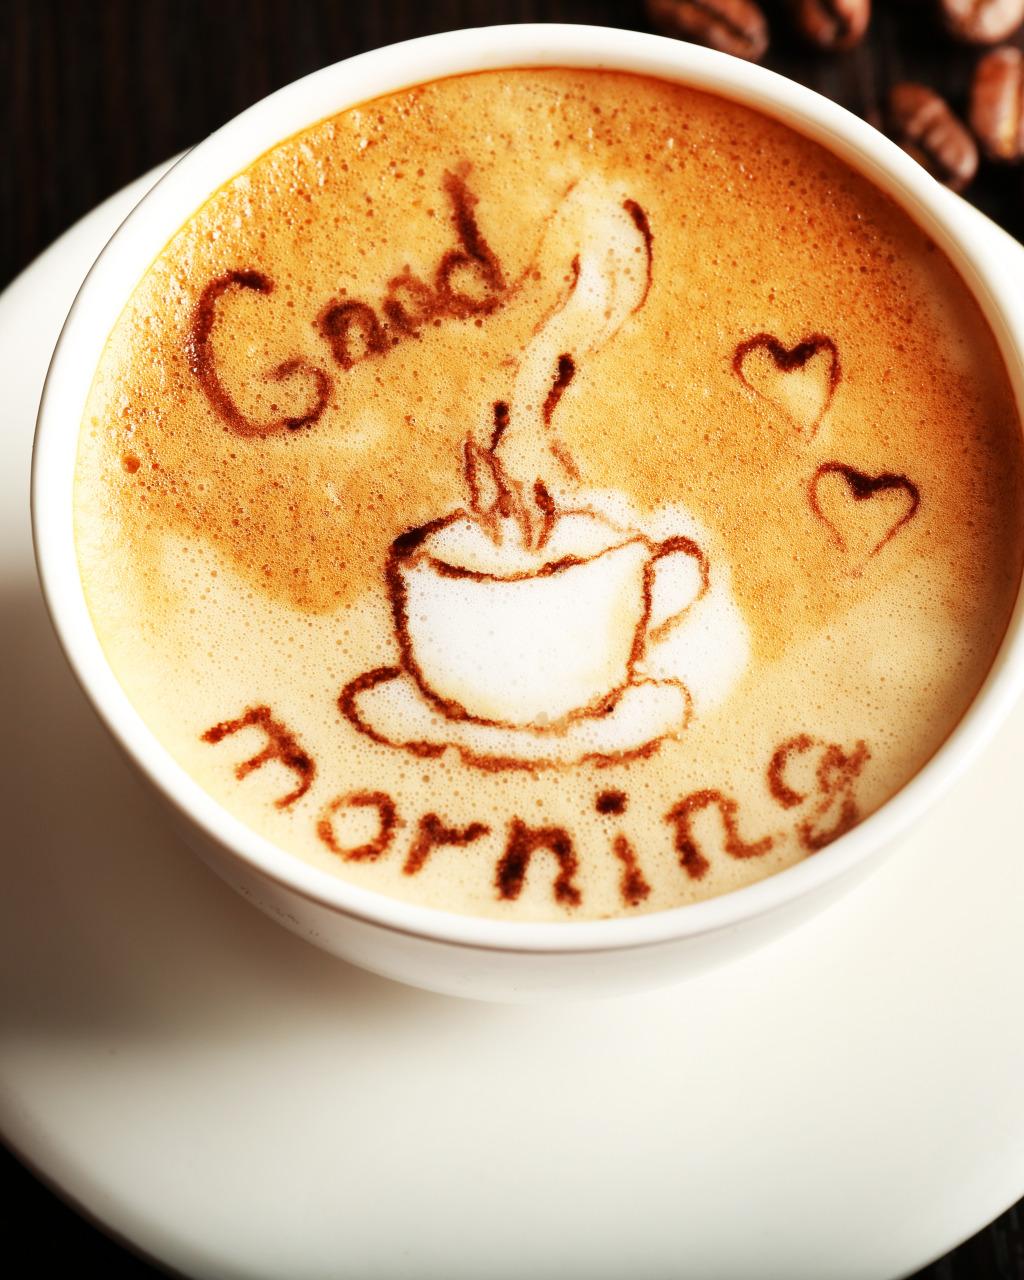 https://img3.goodfon.ru/original/1024x1280/7/79/coffee-beans-cup-good-morning.jpg